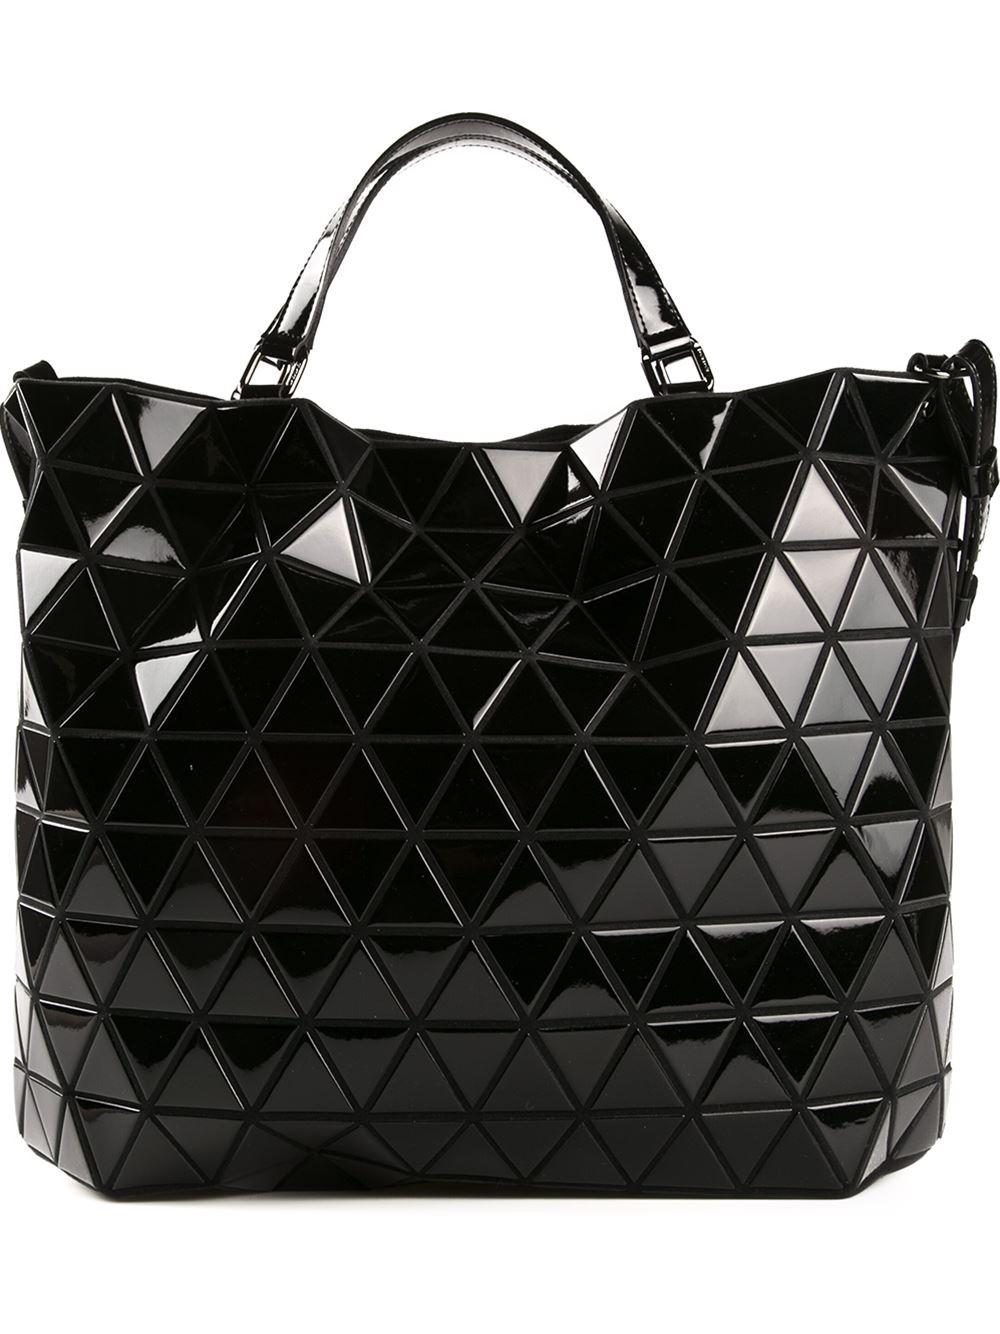 Lyst  Bao Bao Issey Miyake Geometric Cross Body Bag in Black